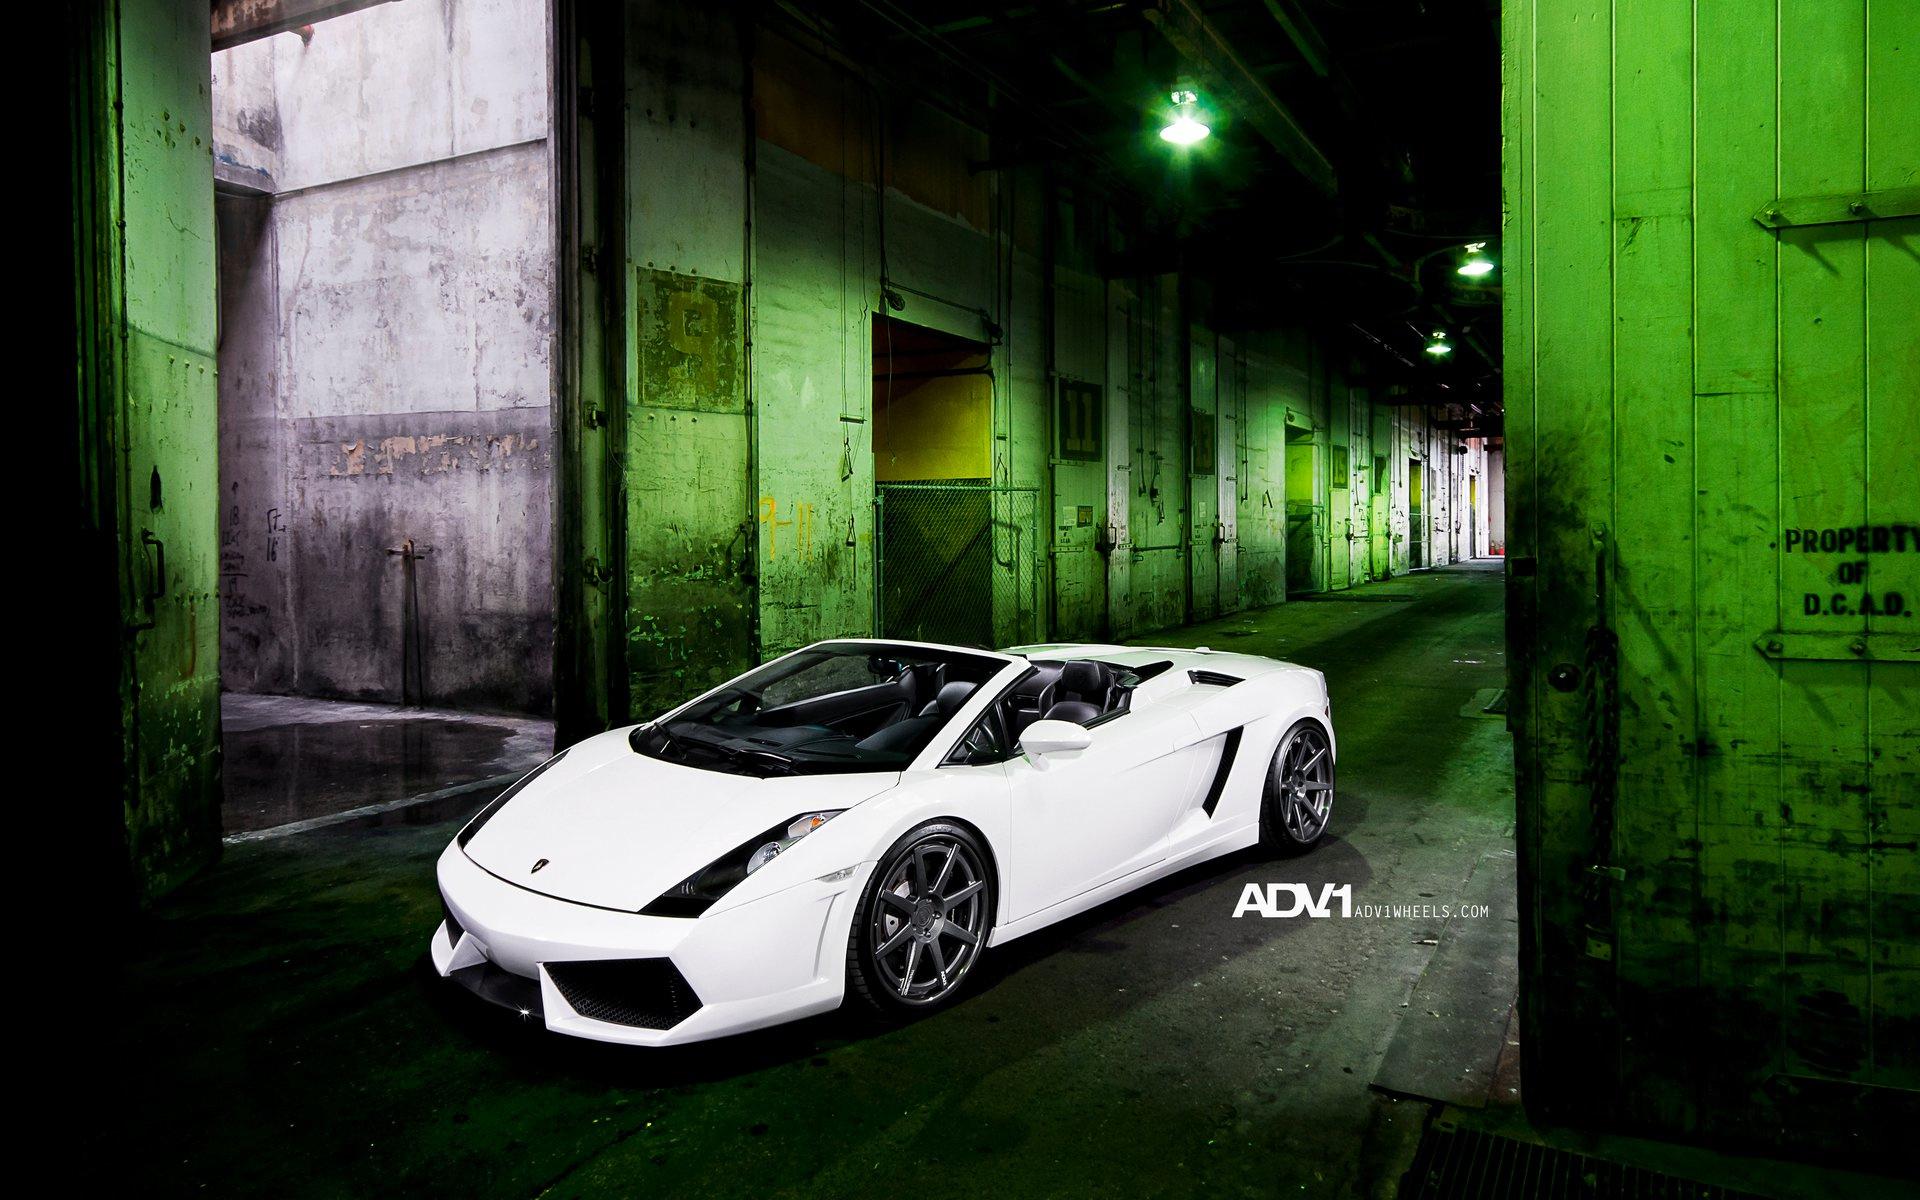 Adv1 Aventador Lamborghini Miami Wallpapers: Lamborghini Gallardo ADV1 Wheels Wallpaper